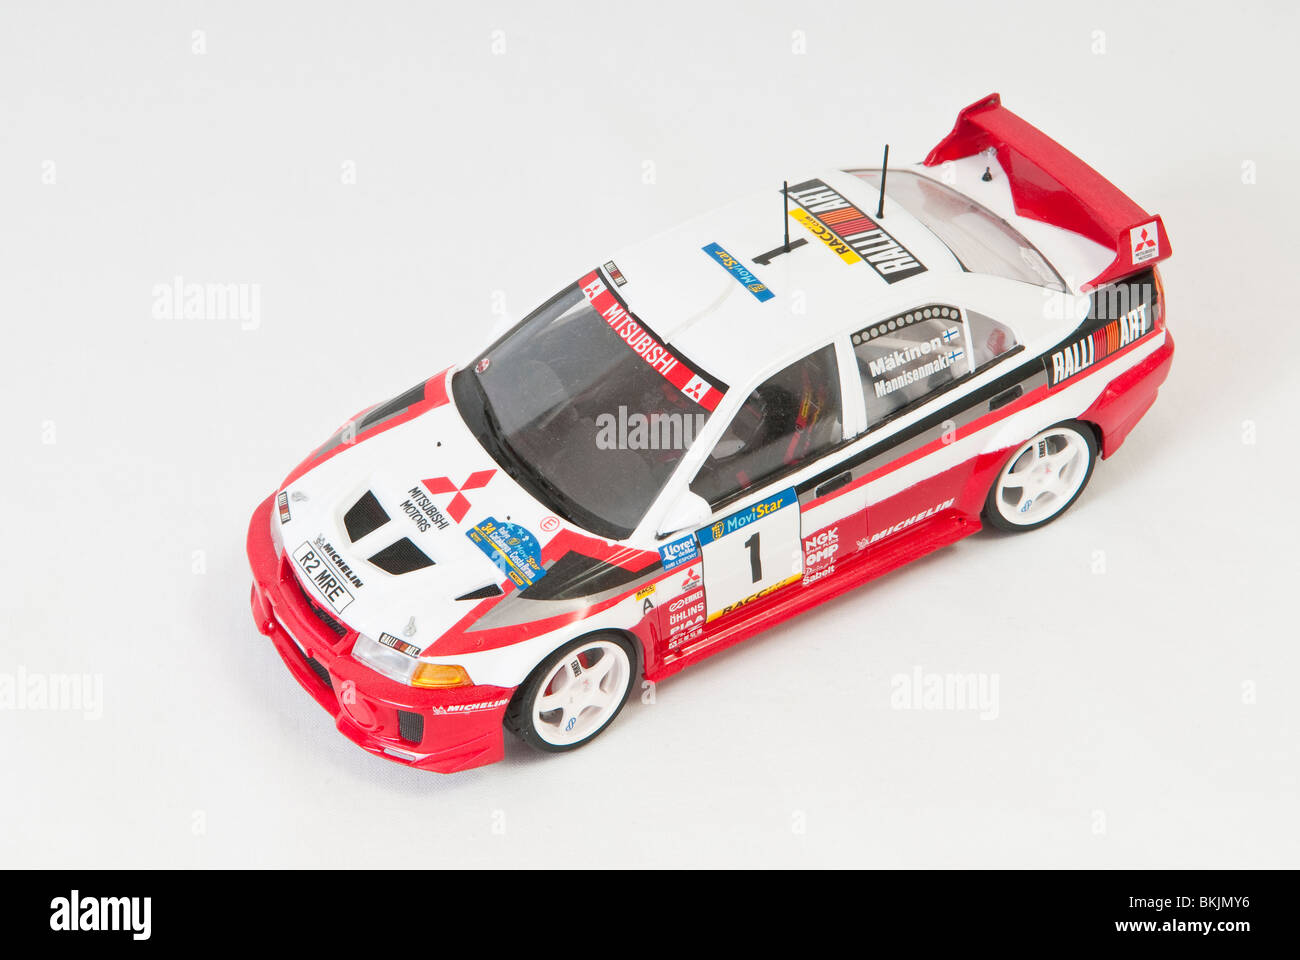 Model Of A Mitsubishi Evo 6 Rally Car Stock Photo